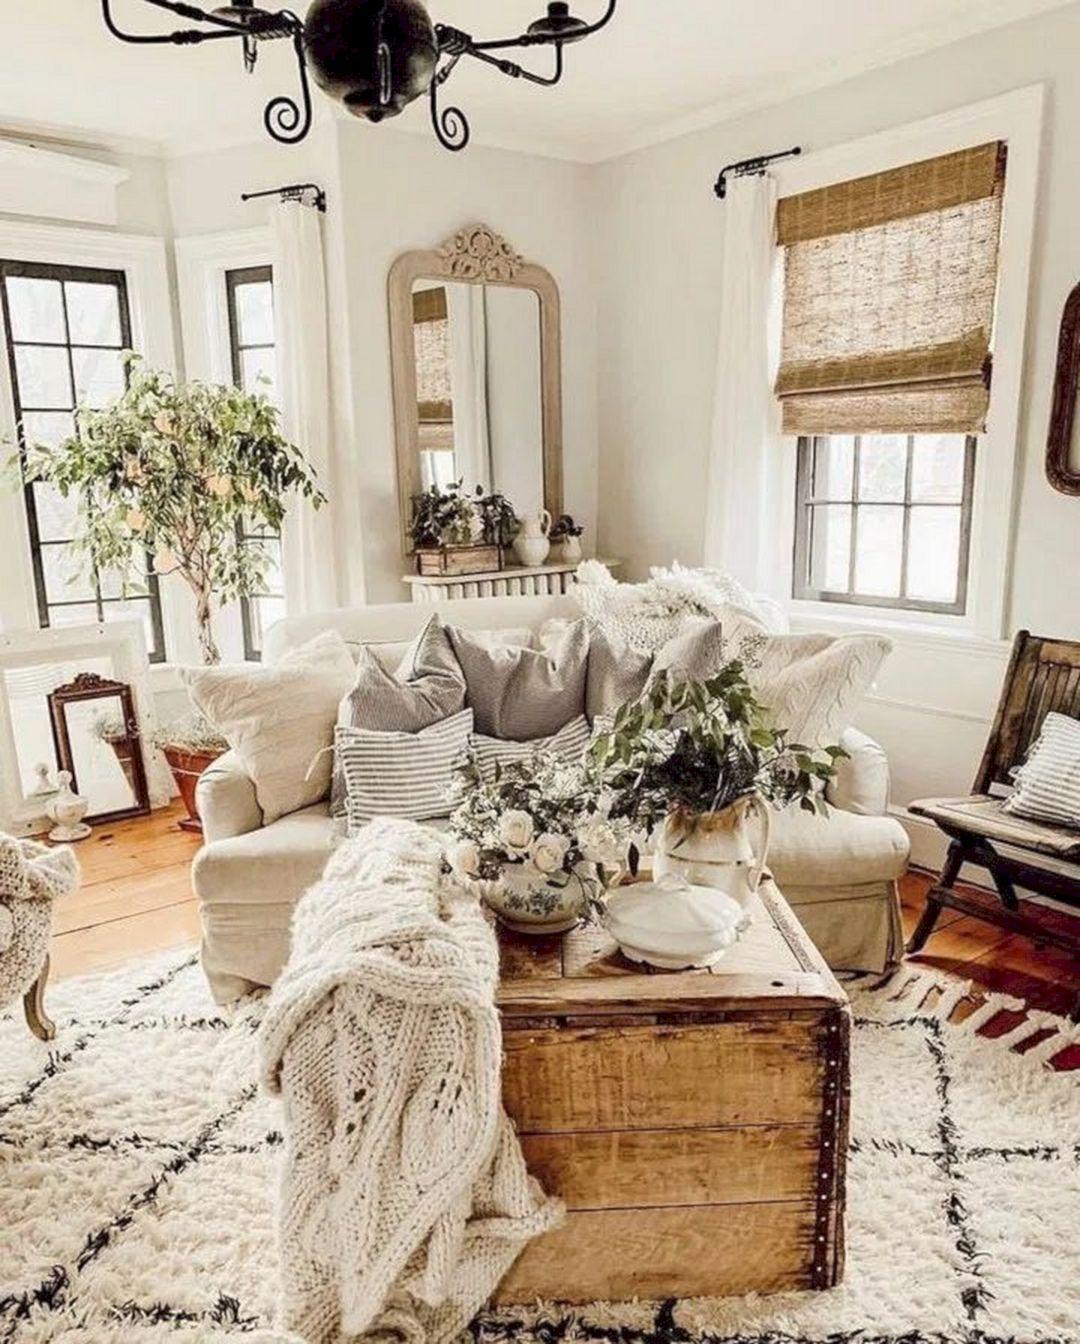 Best 10 Attractive Farmhouse Living Room Design And Decoration Ideas Farmhouse Decor Living Room Farm House Living Room Curtains Living Room